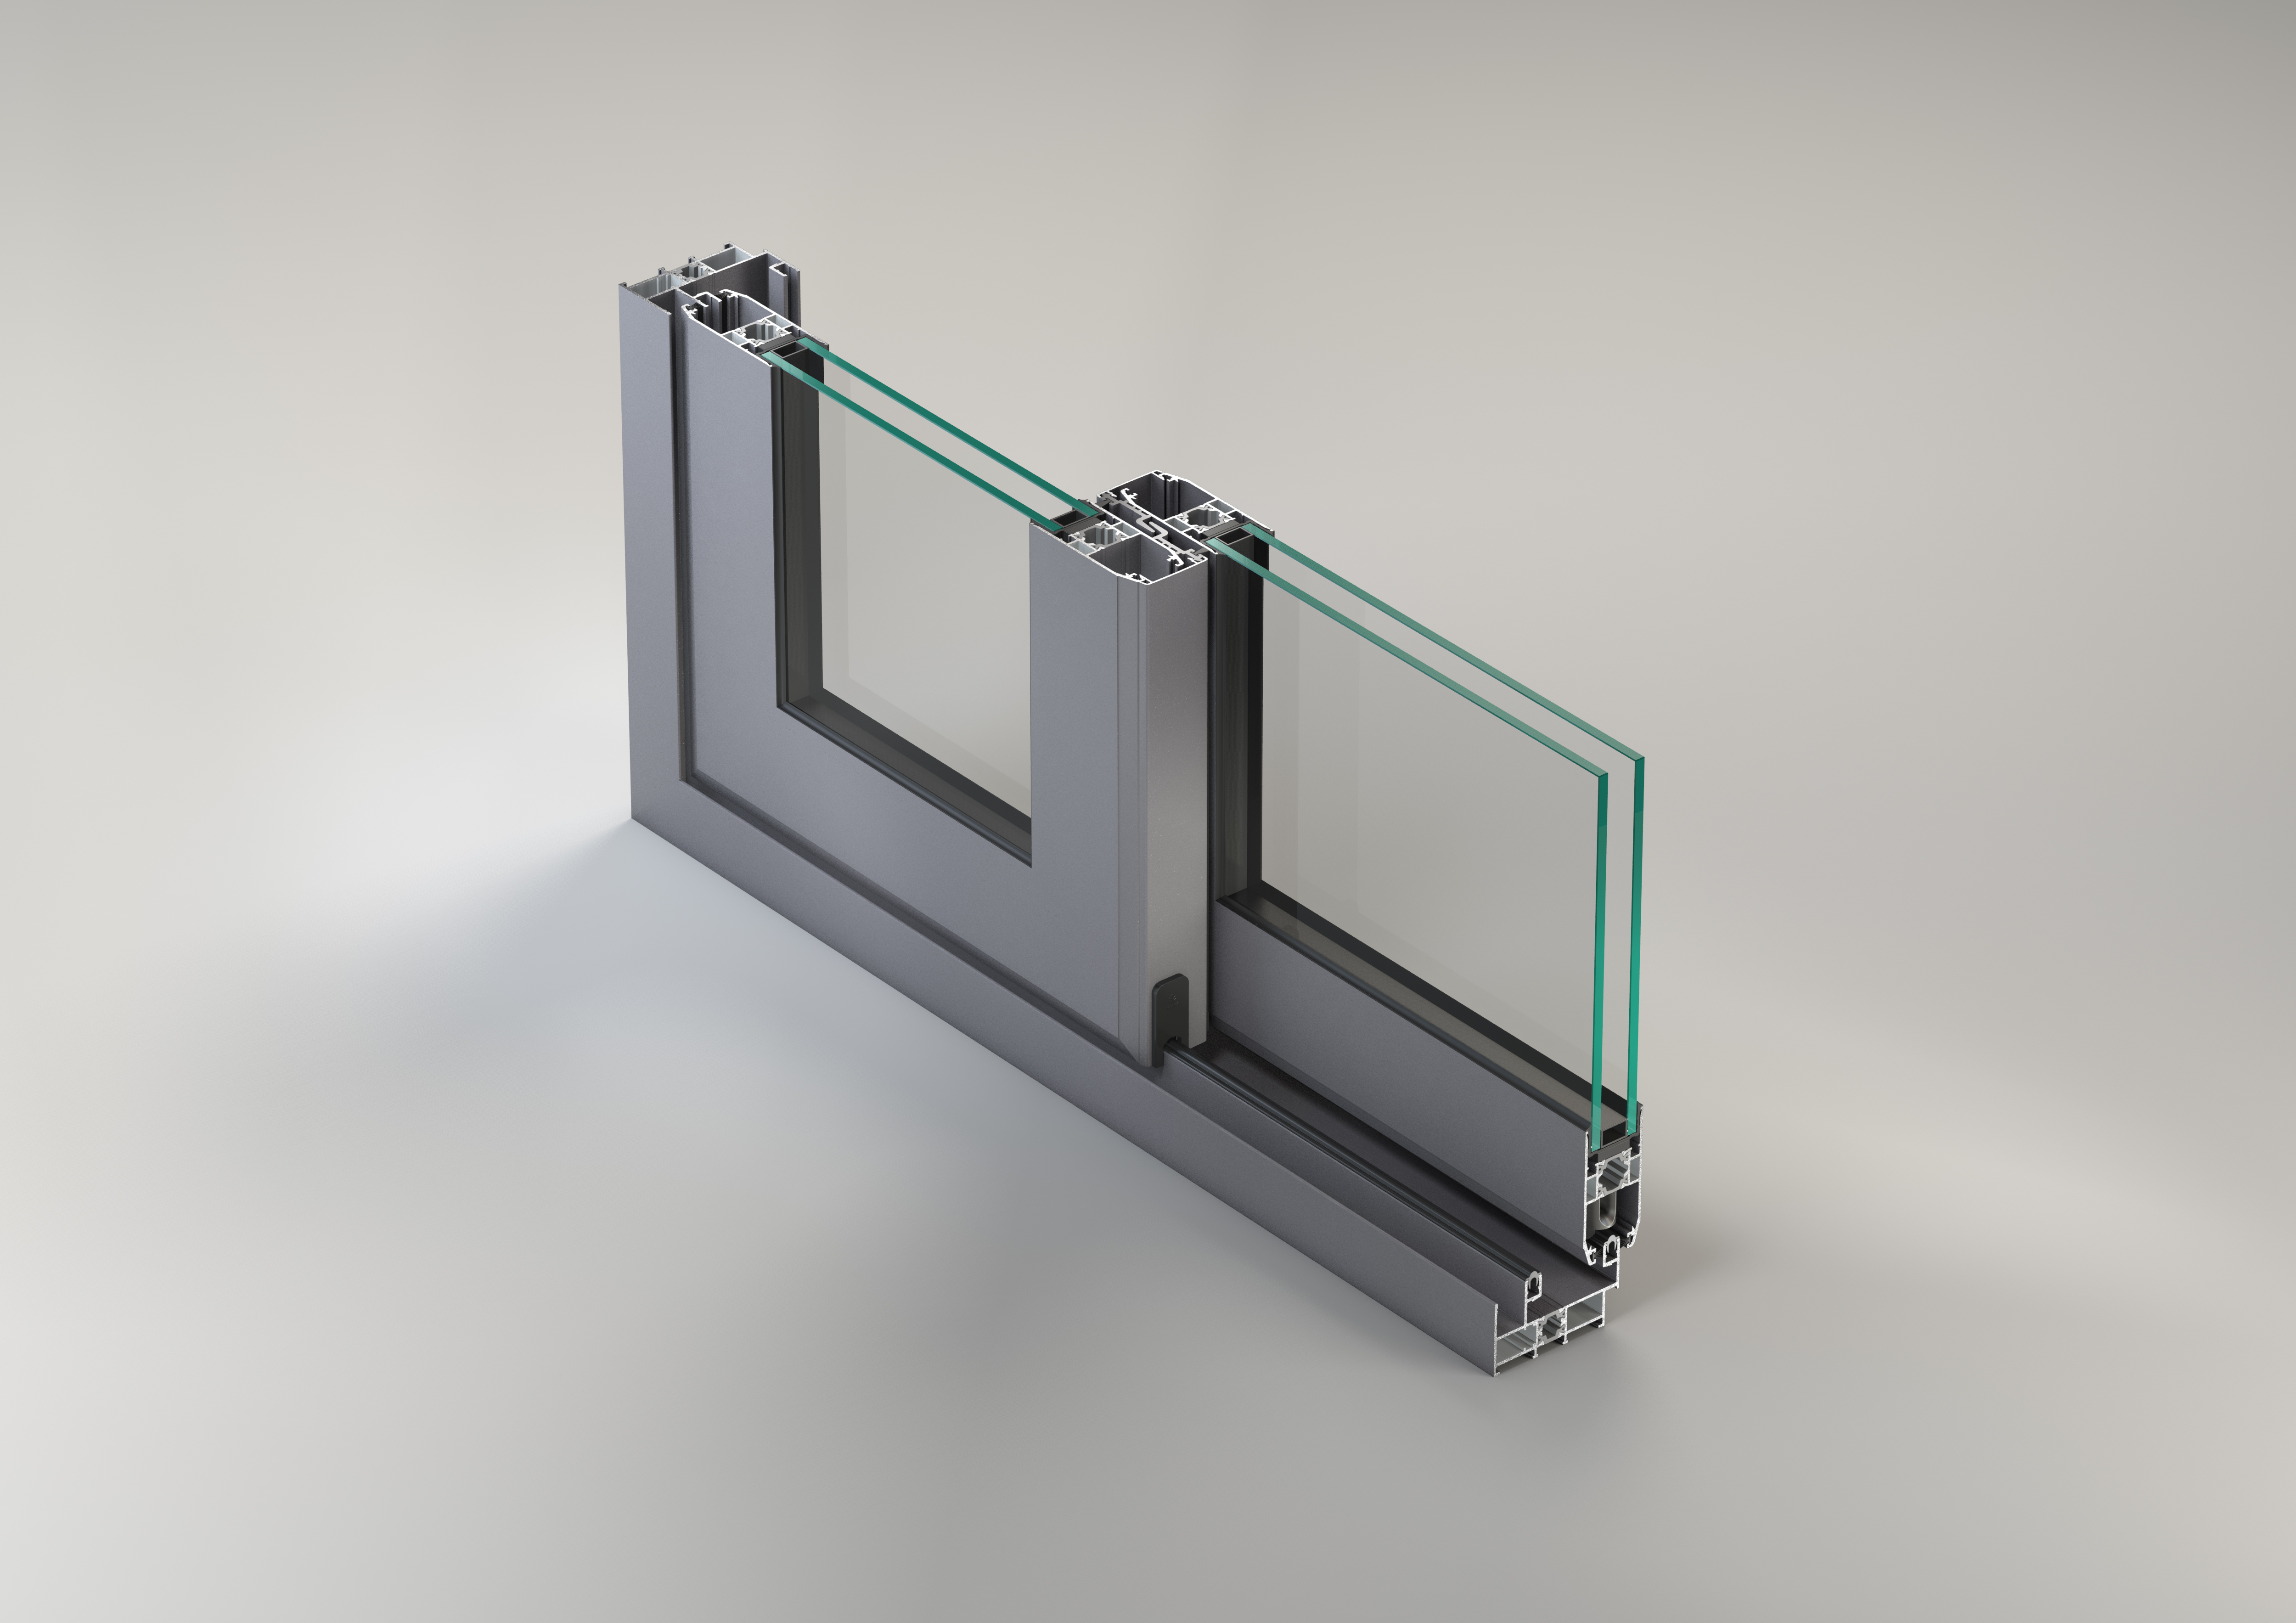 Sisteme aluminiu pentru usi glisante LEYKOM METRA - Poza 4